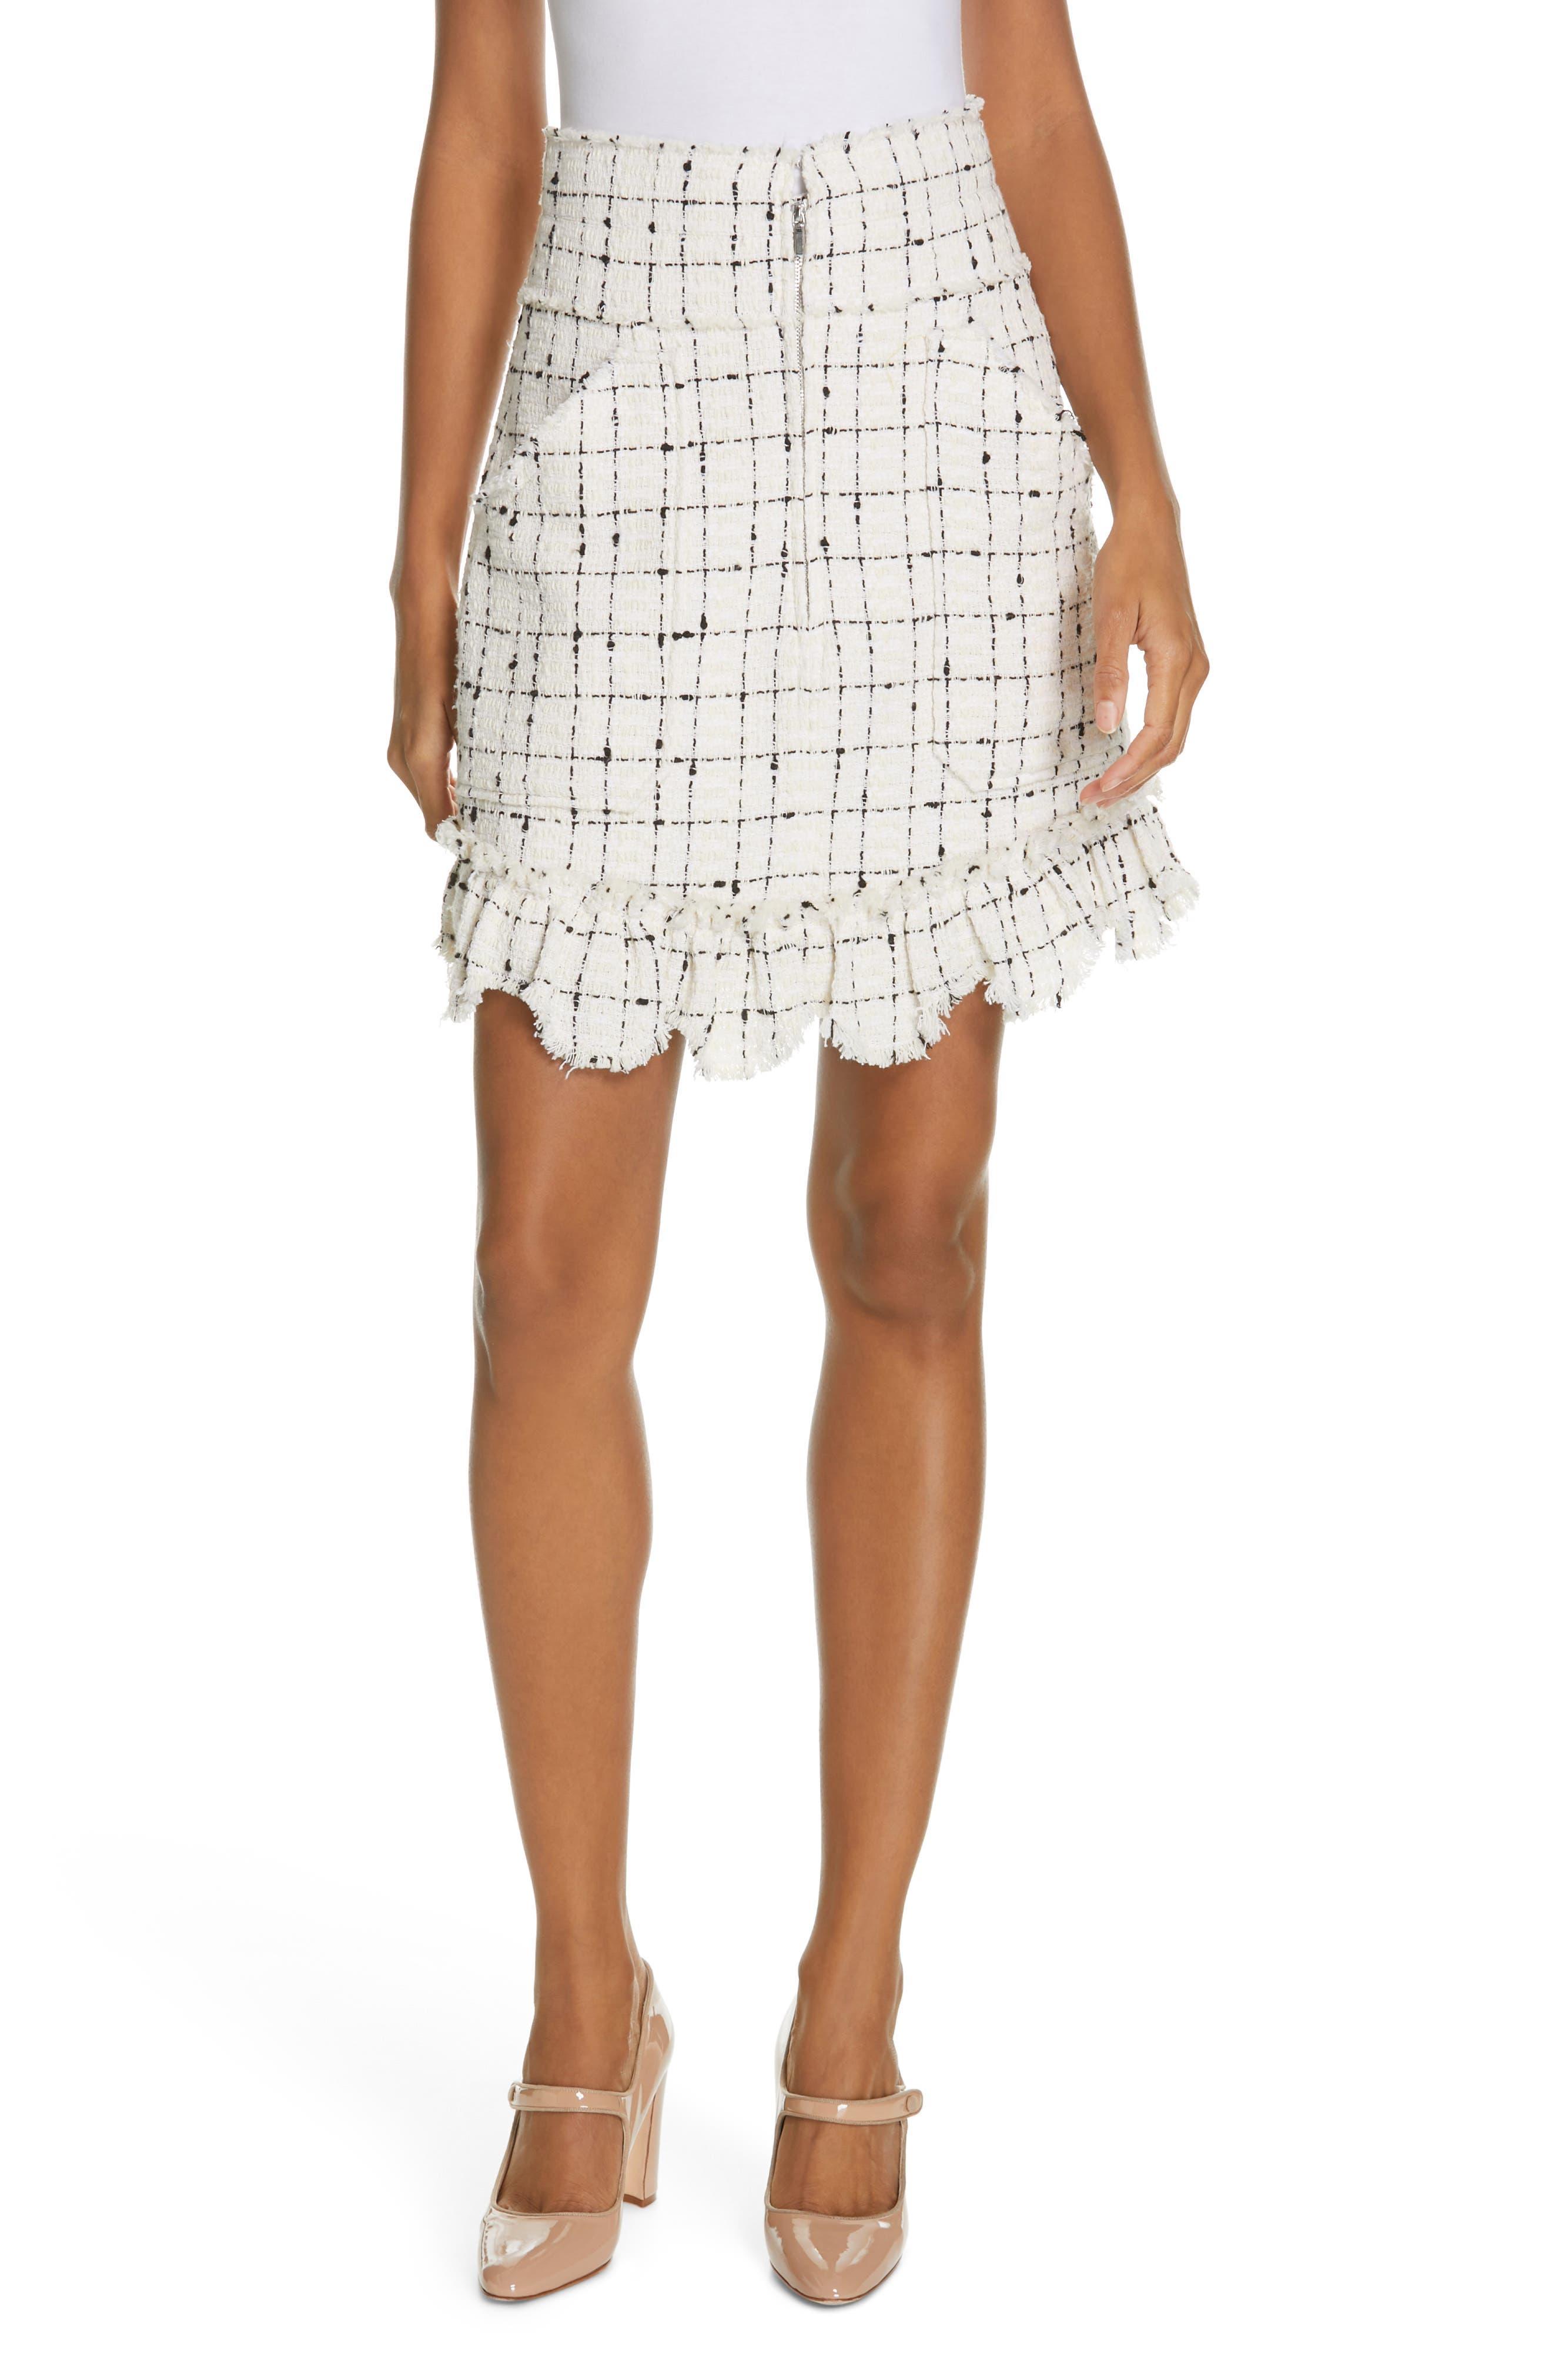 REBECCA TAYLOR, Scallop Hem Tweed Skirt, Main thumbnail 1, color, CREAM COMBO